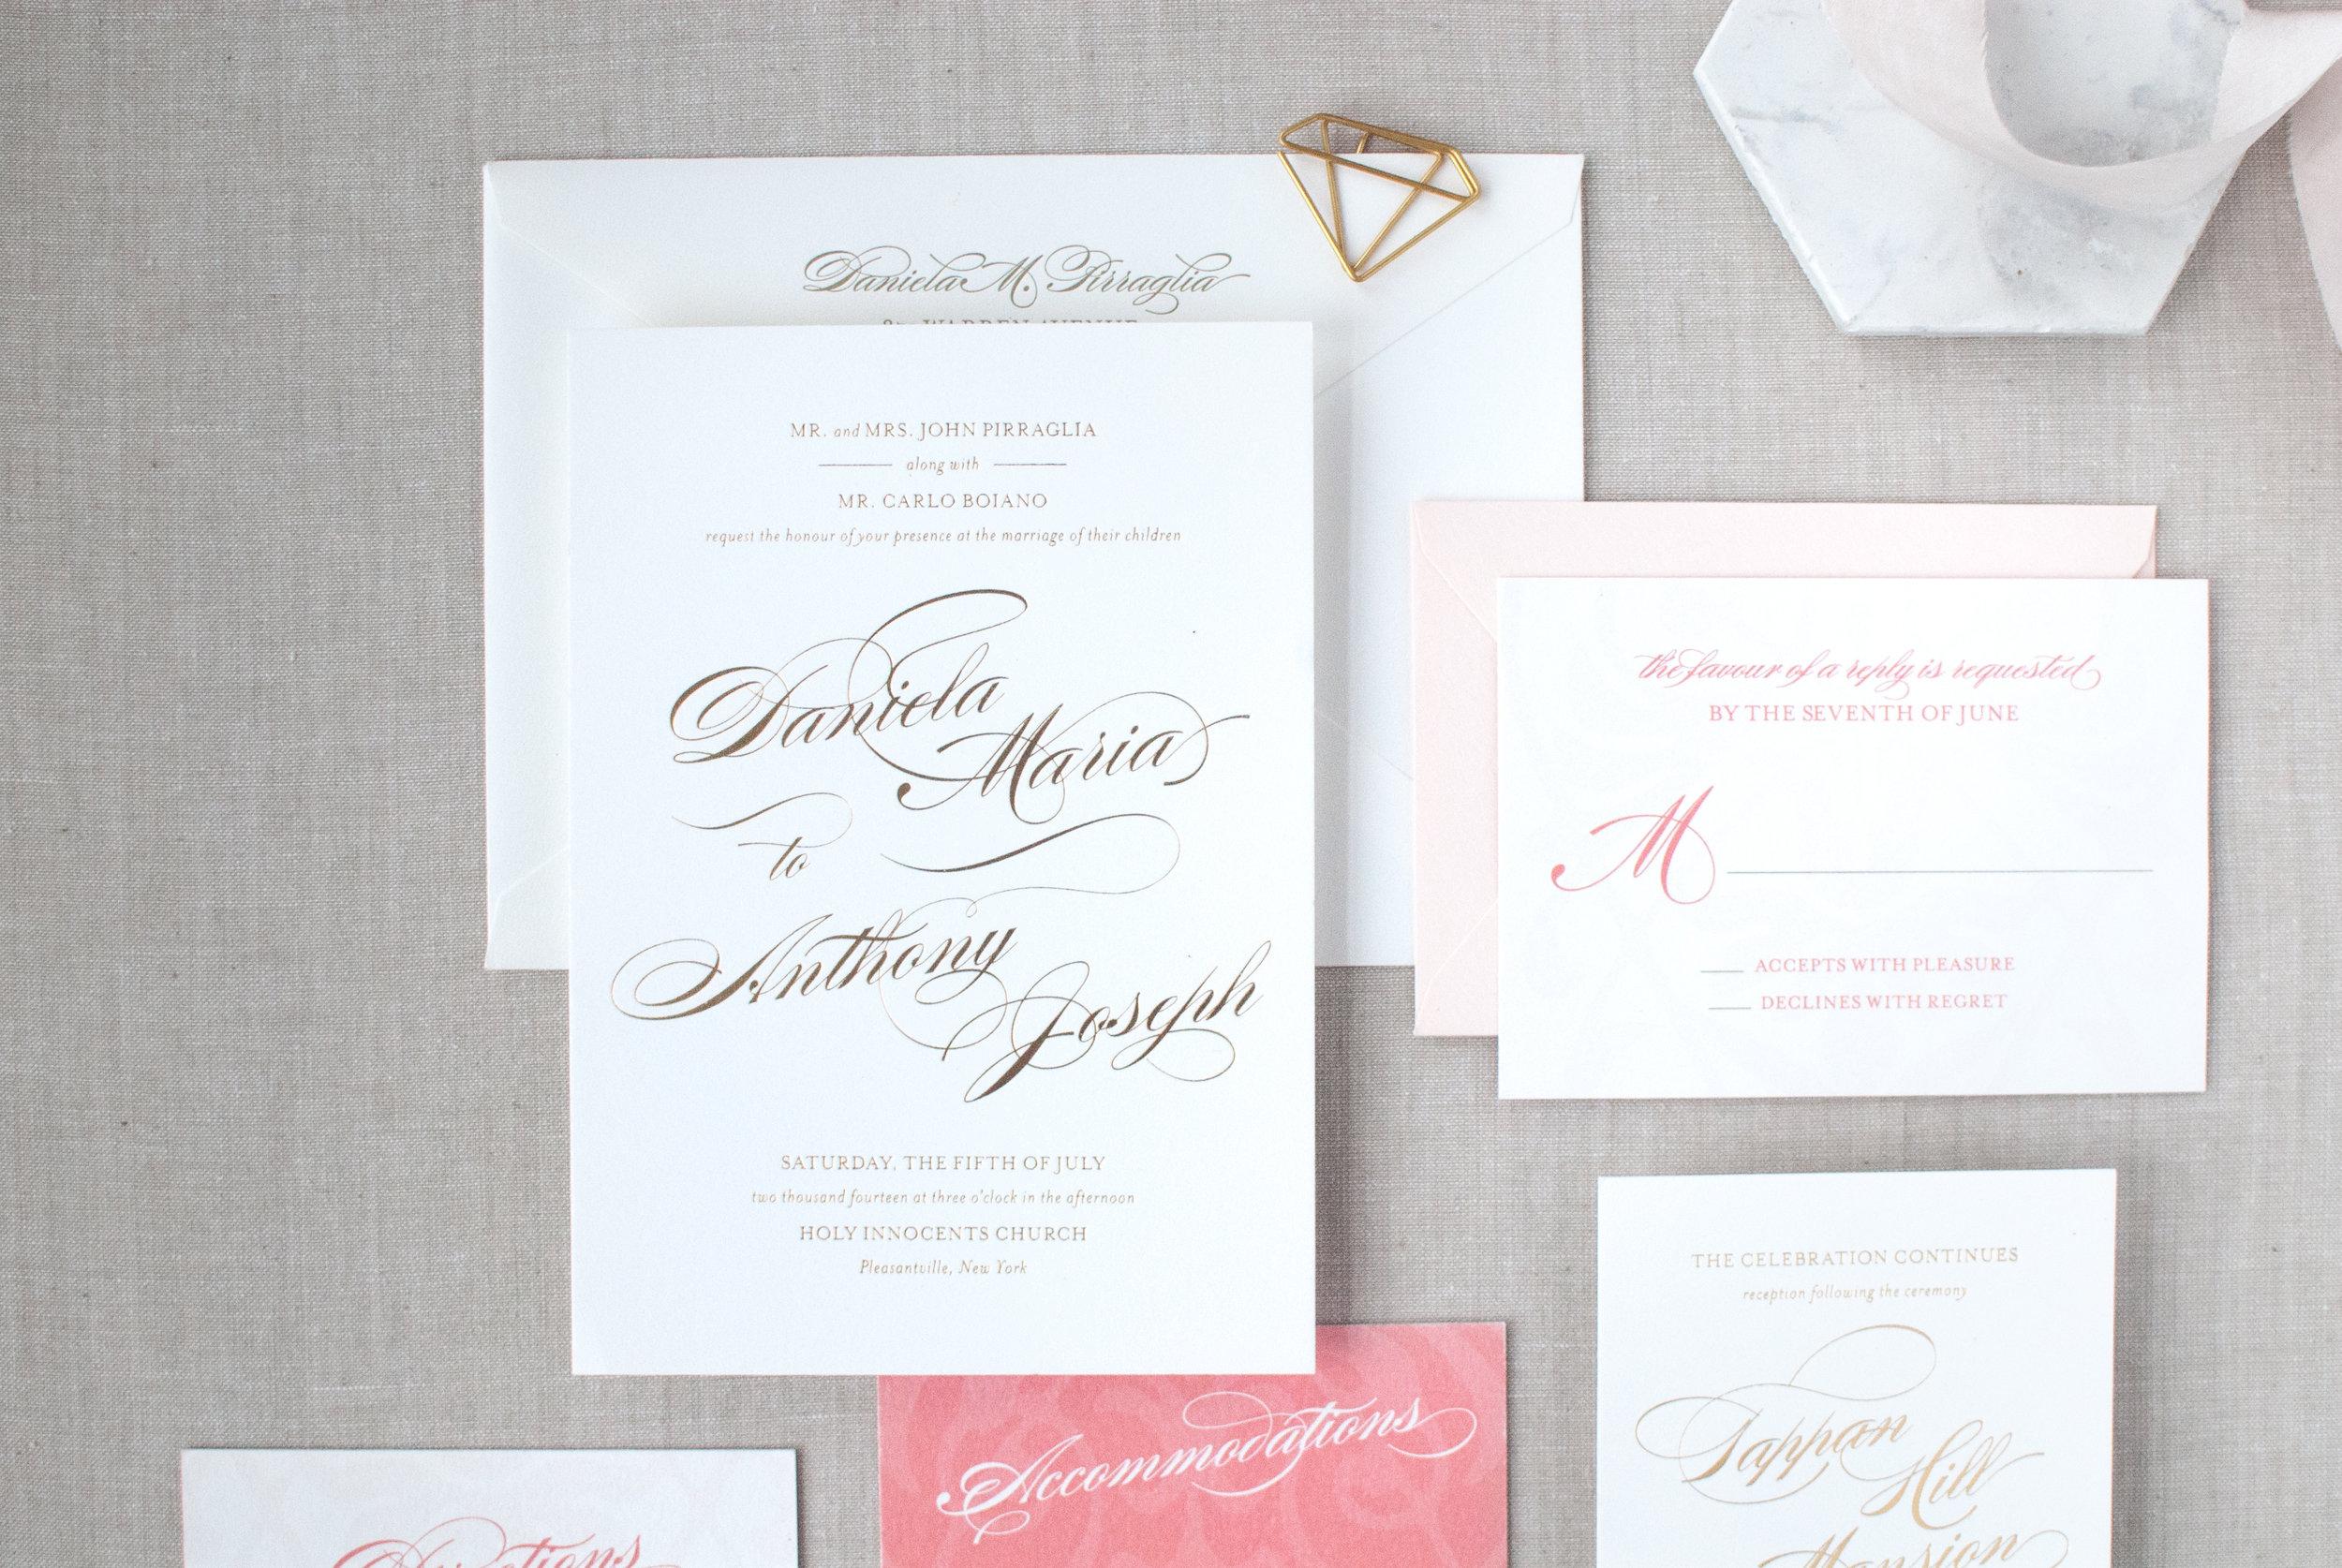 hj-wedding-invitations-daniela-anthony-6.jpg